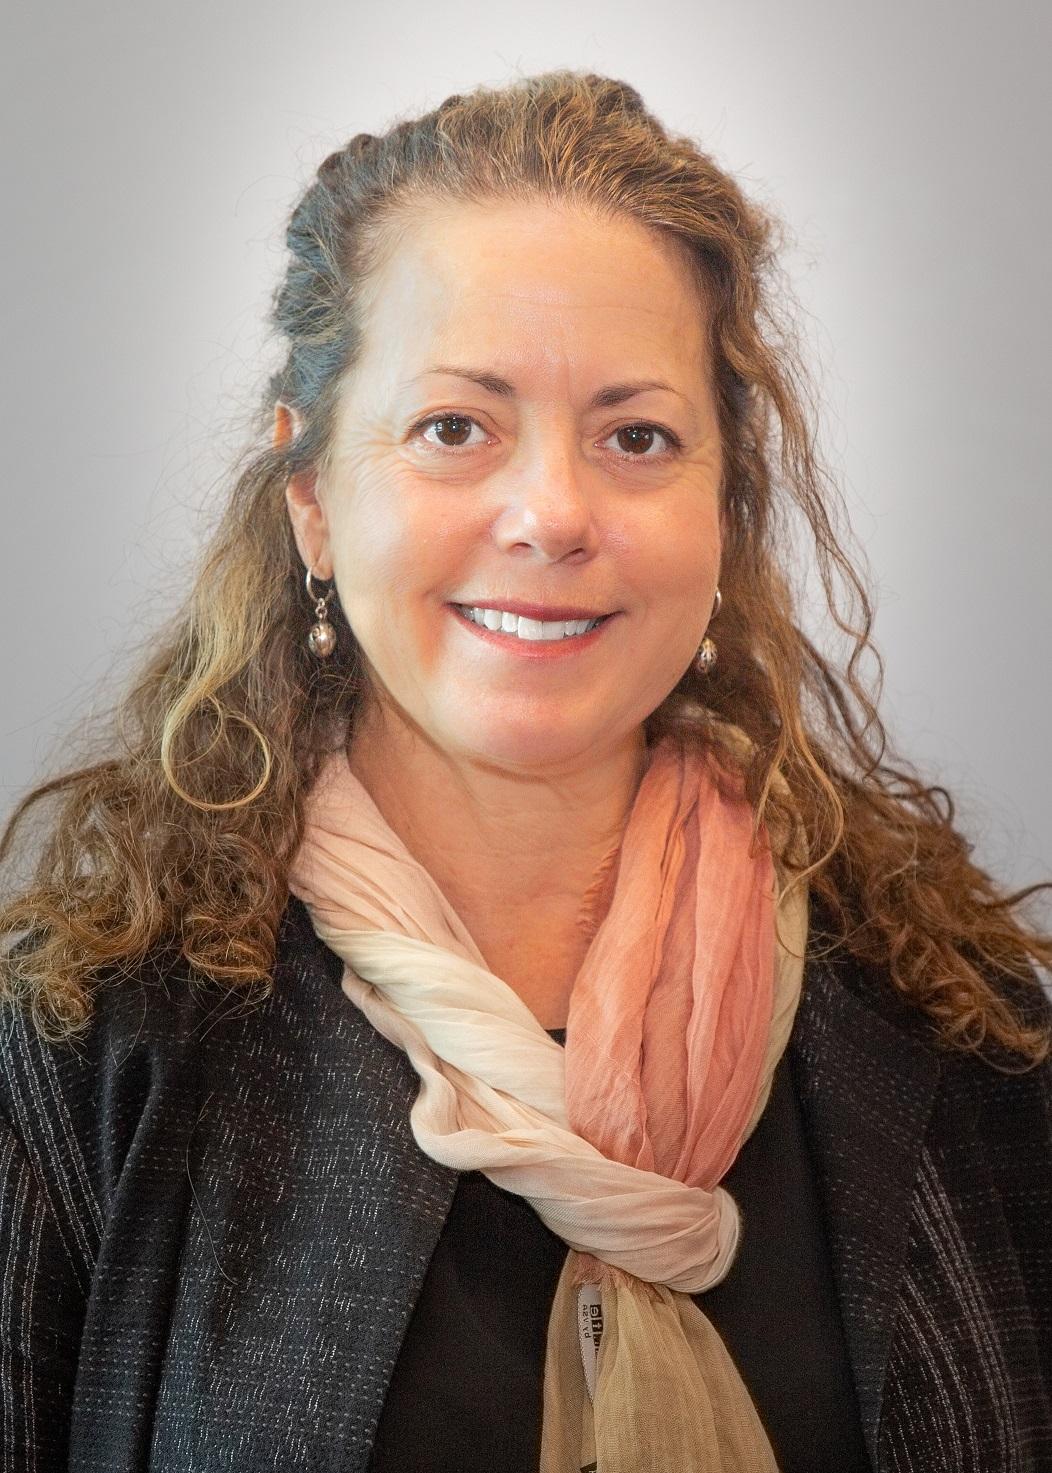 Loren Kelly, MSN, Enfermera registrada